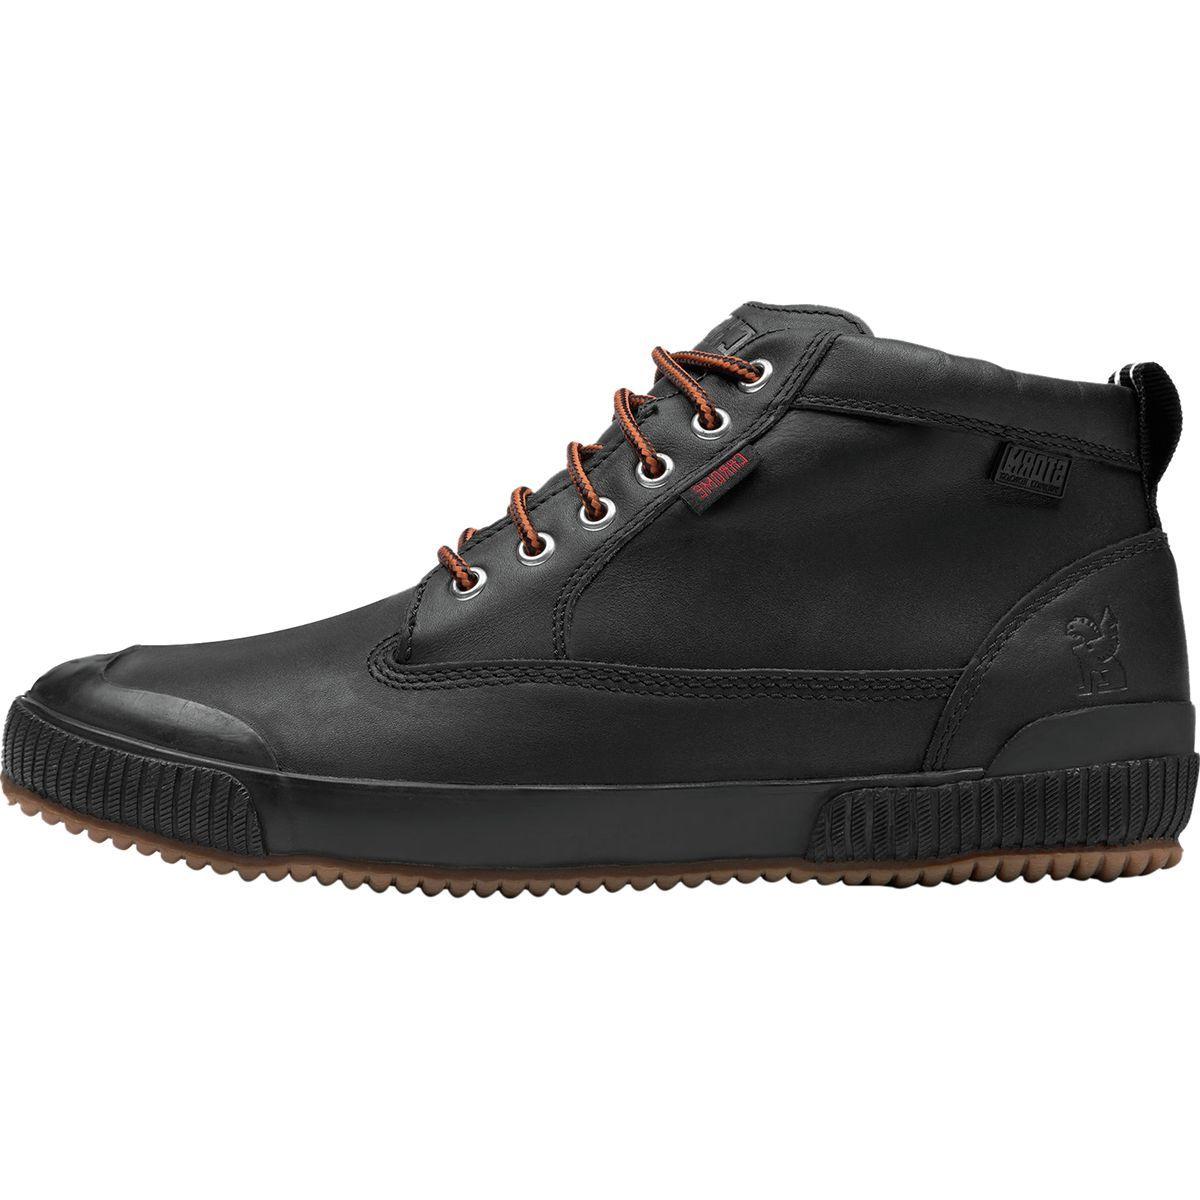 Chrome Storm 415 Work Boot - Men's